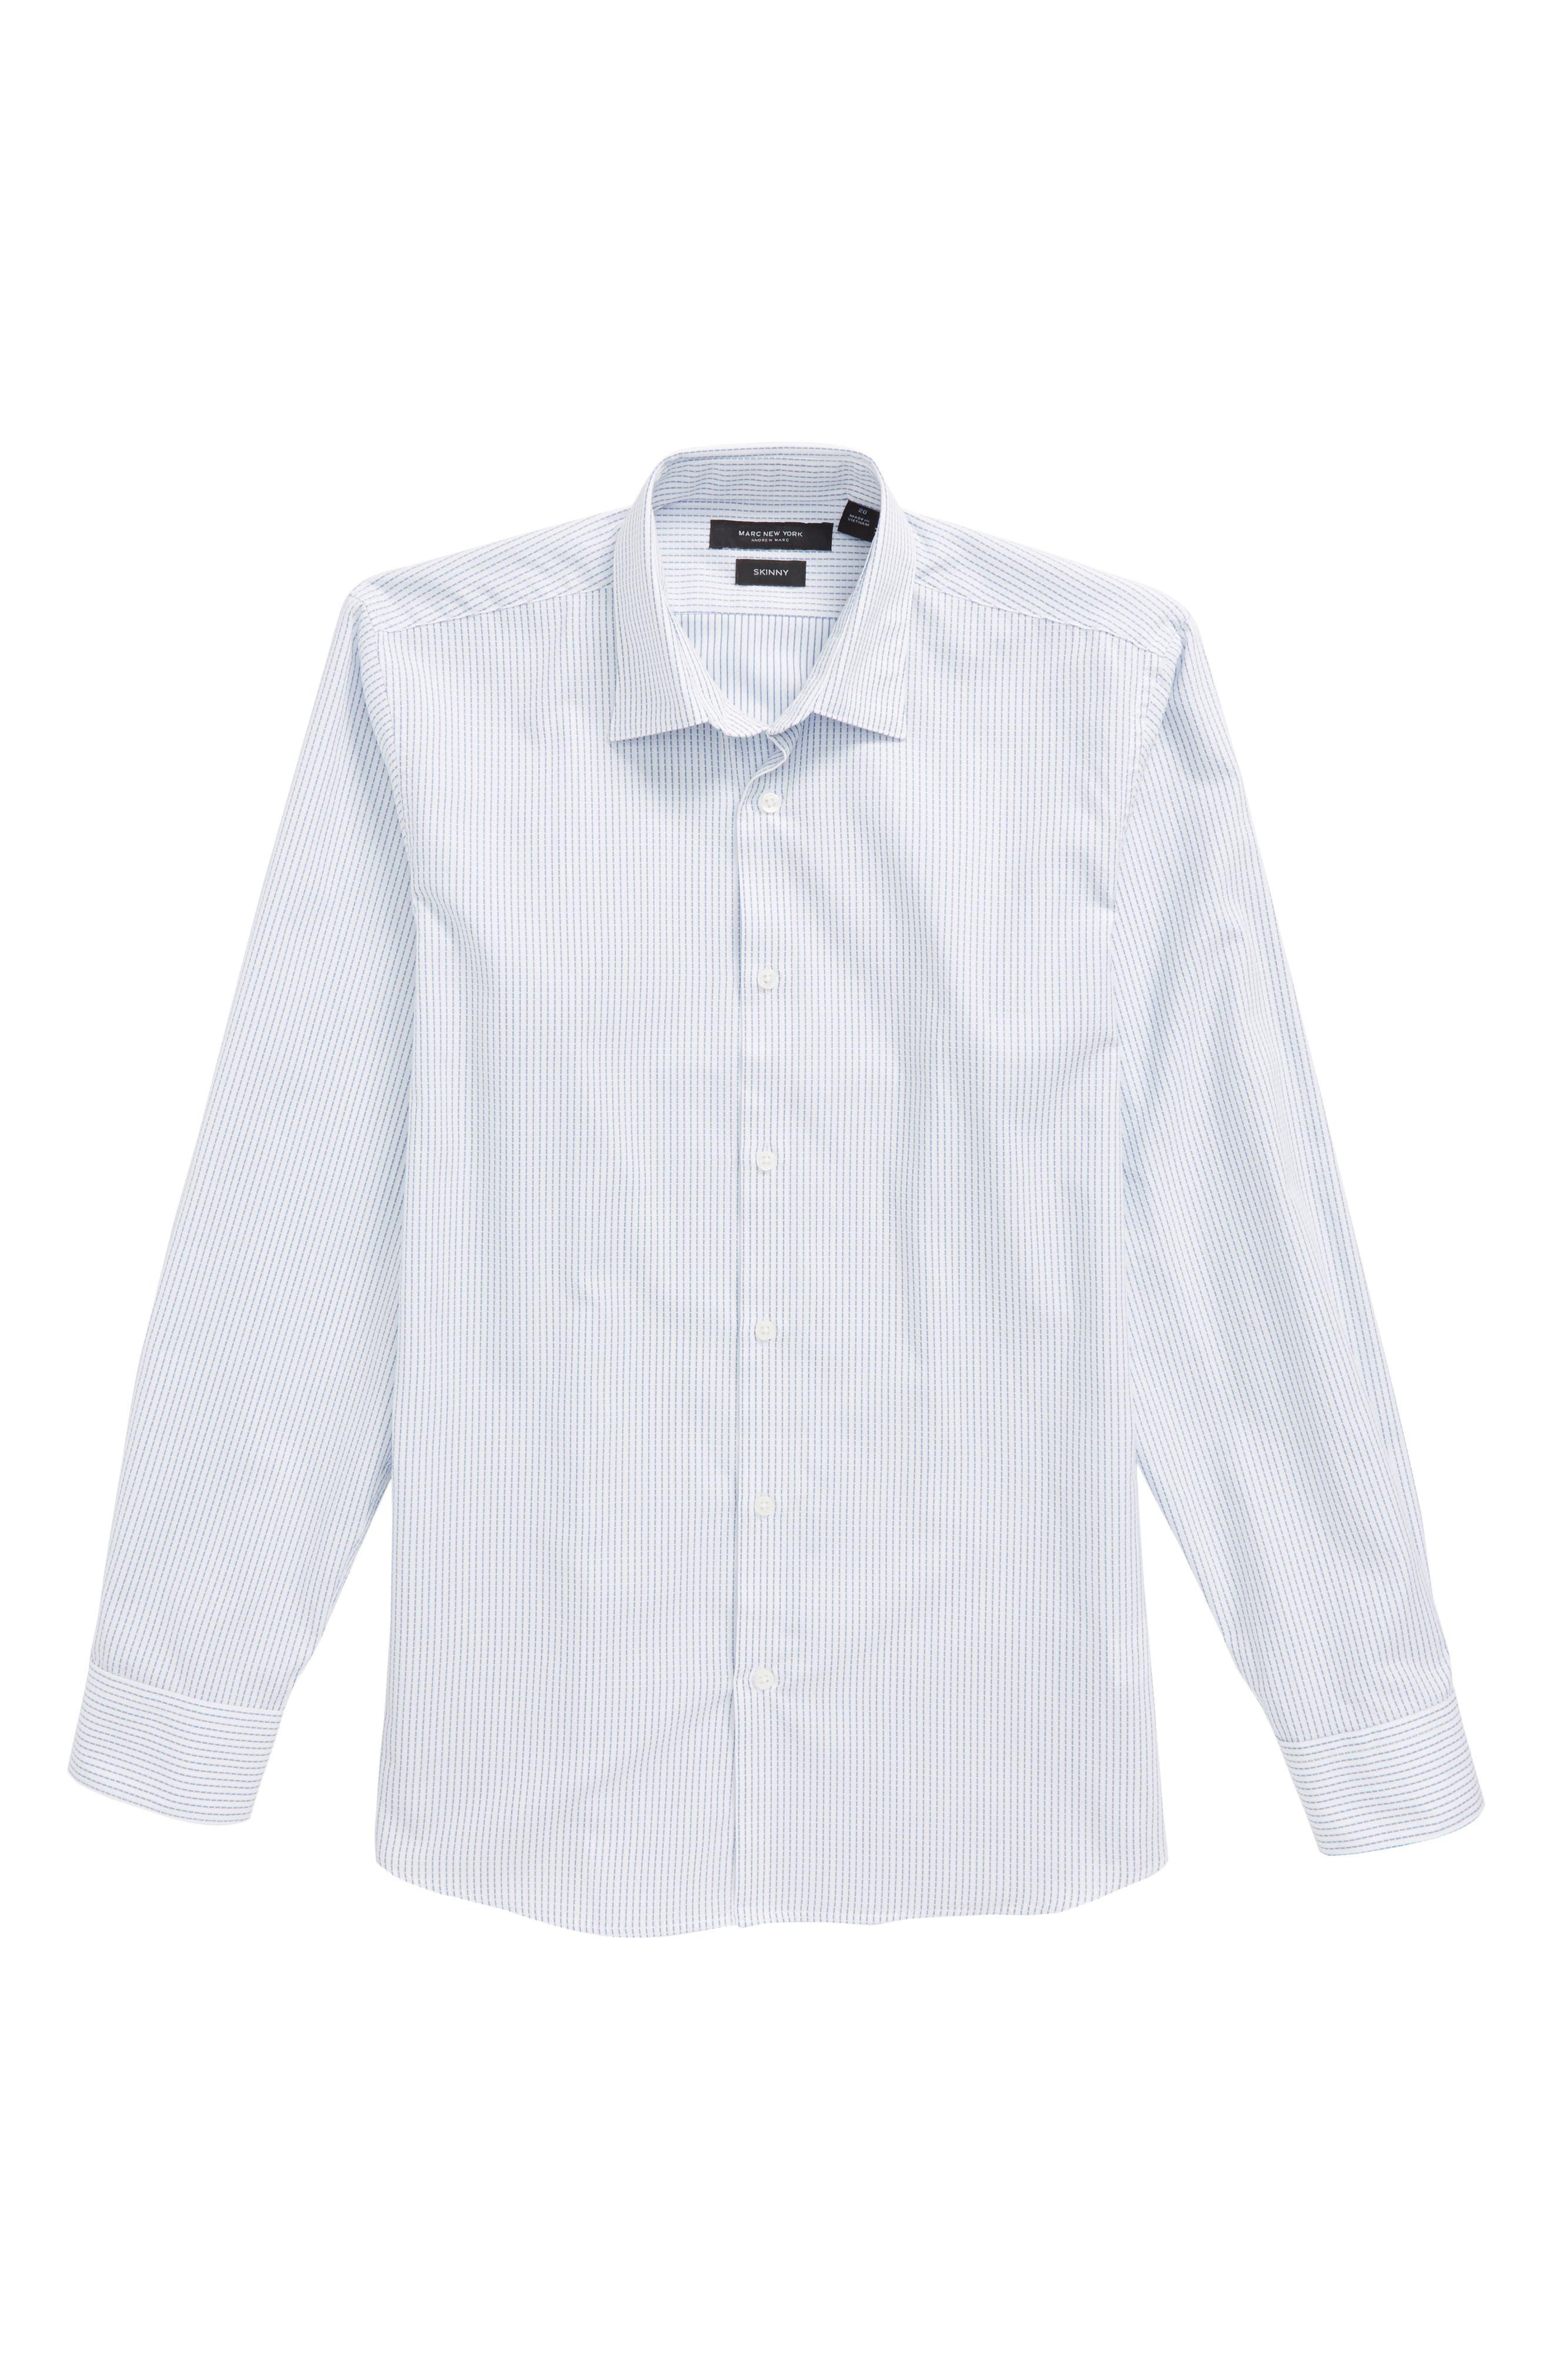 Andrew Marc Stripe Dress Shirt (Big Boys)